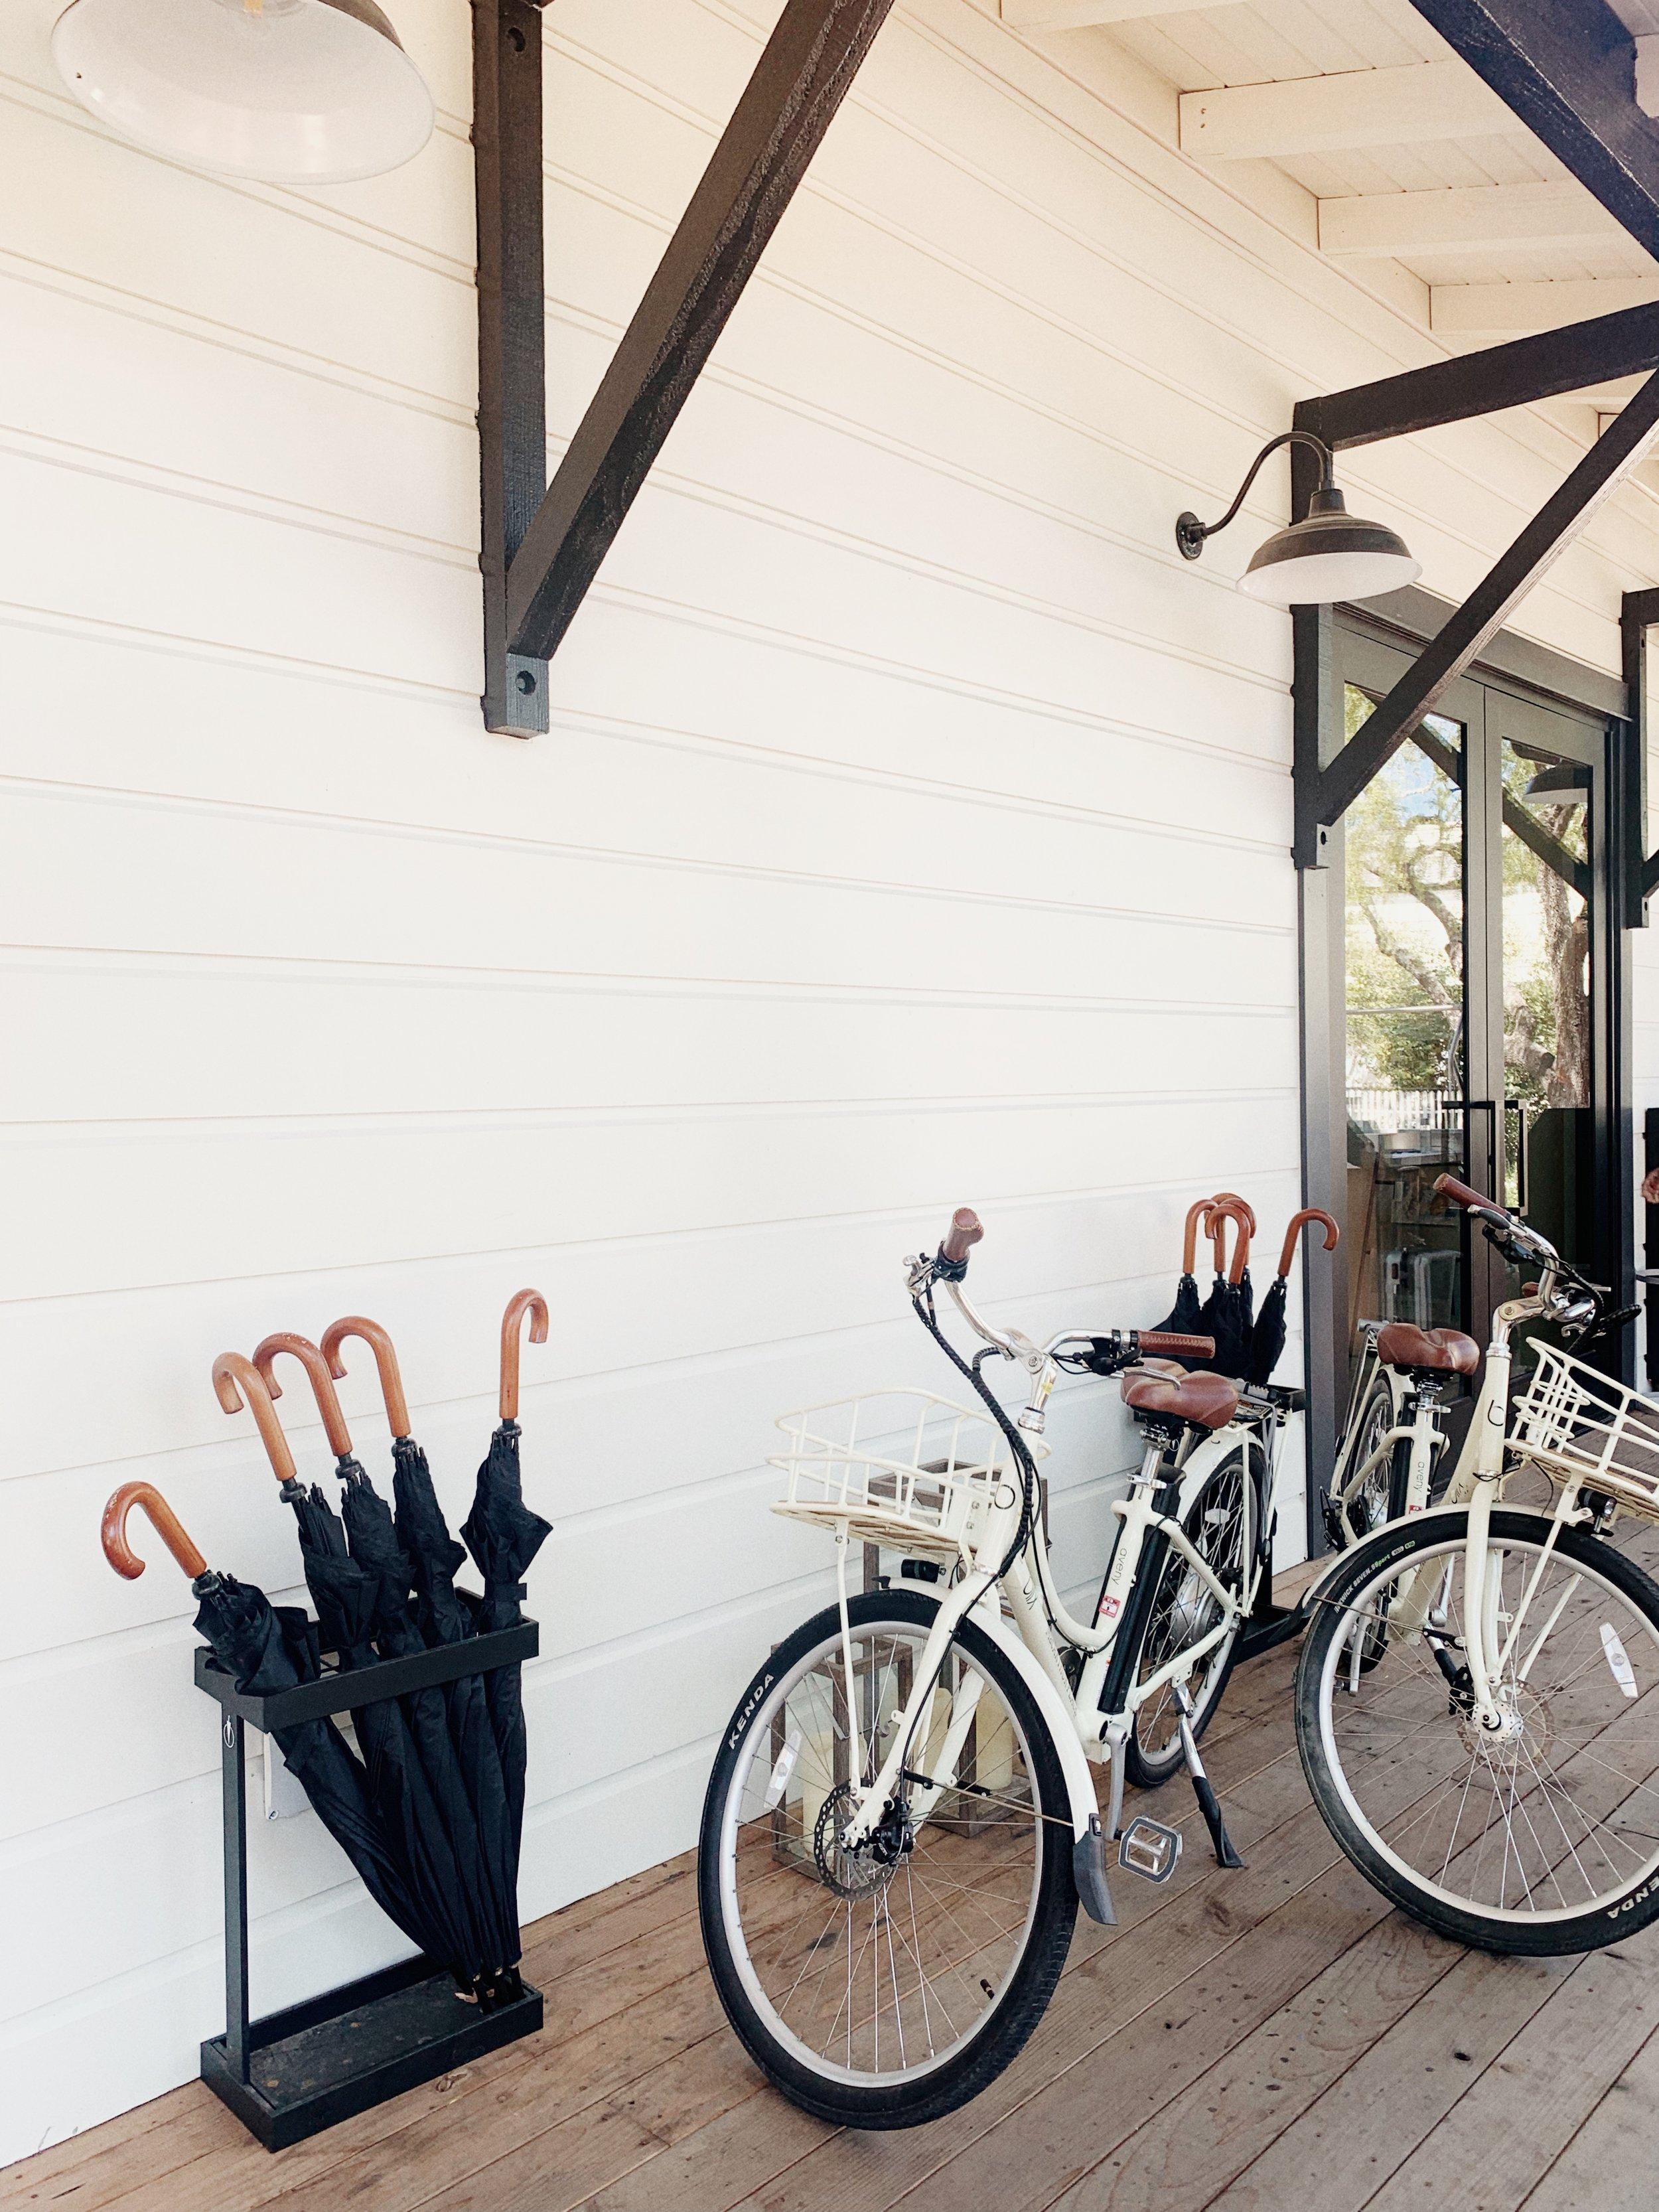 MacArthur Place Blix Bike.JPG